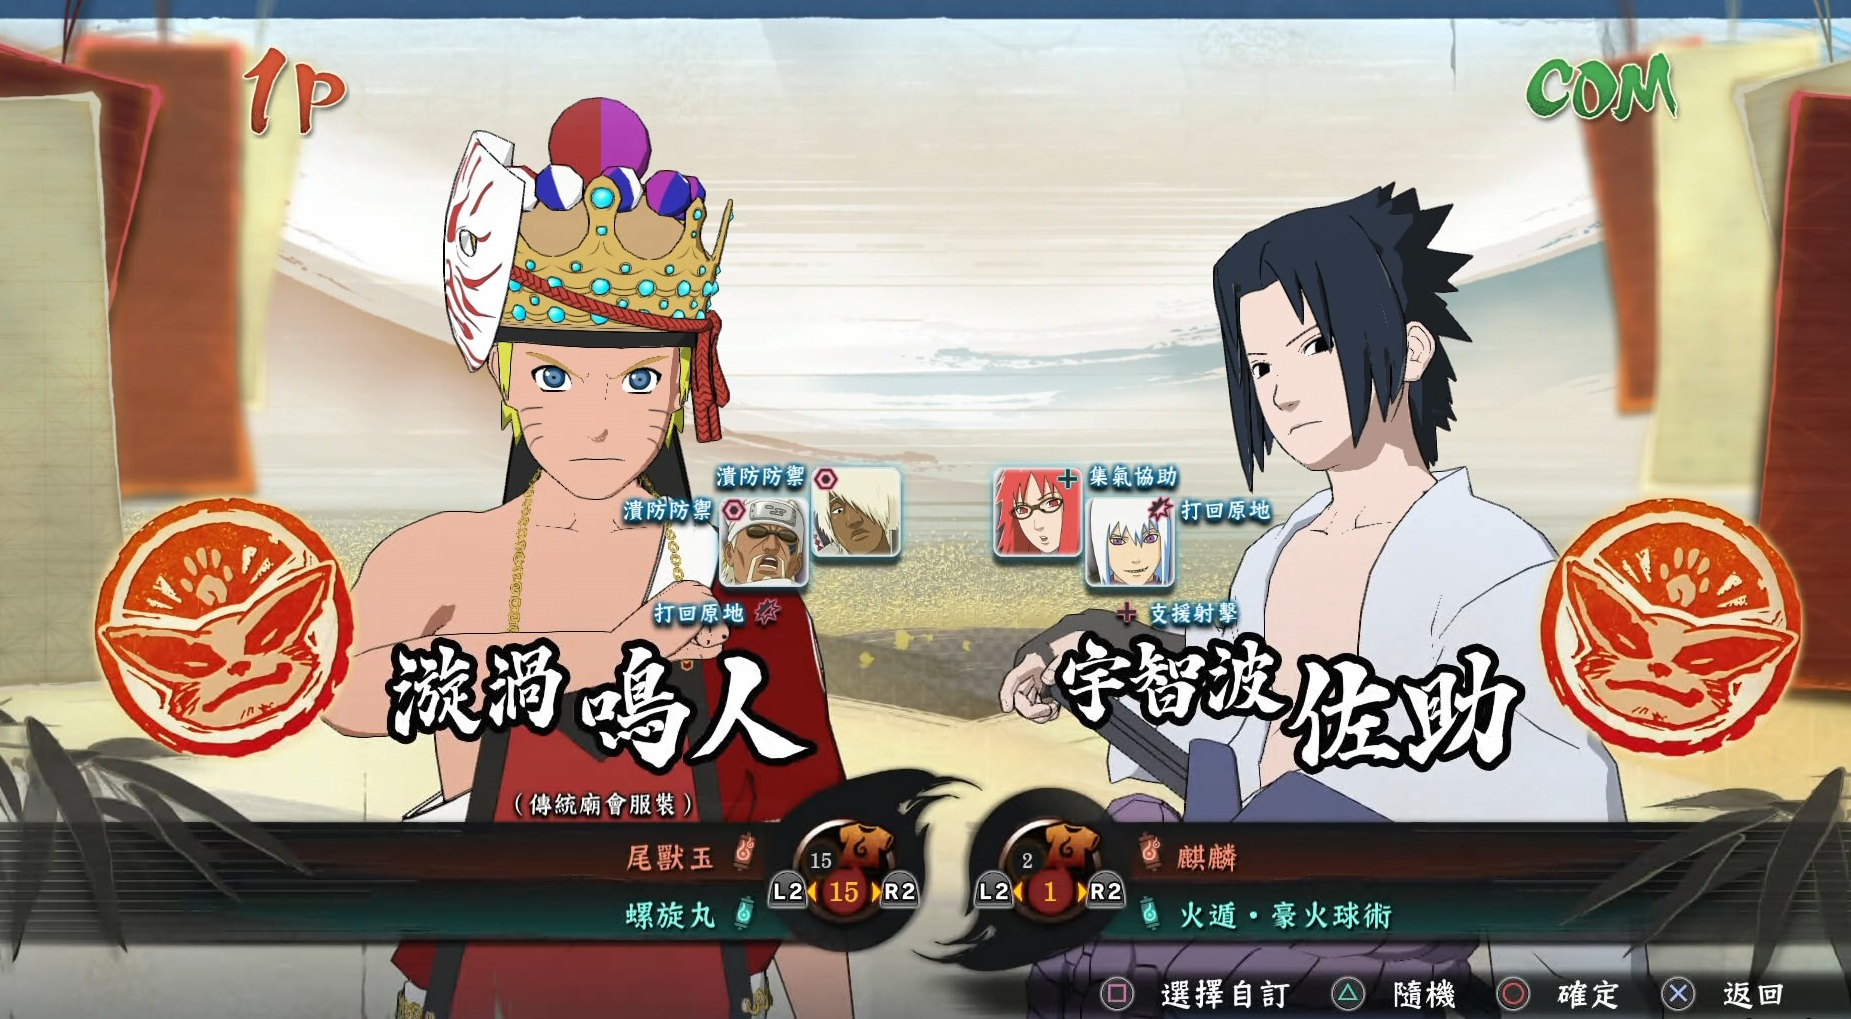 Naruto-Storm-4-traditional-1 Naruto Storm 4: Geleneksel Çin Kostümü DLC'si Duyuruldu